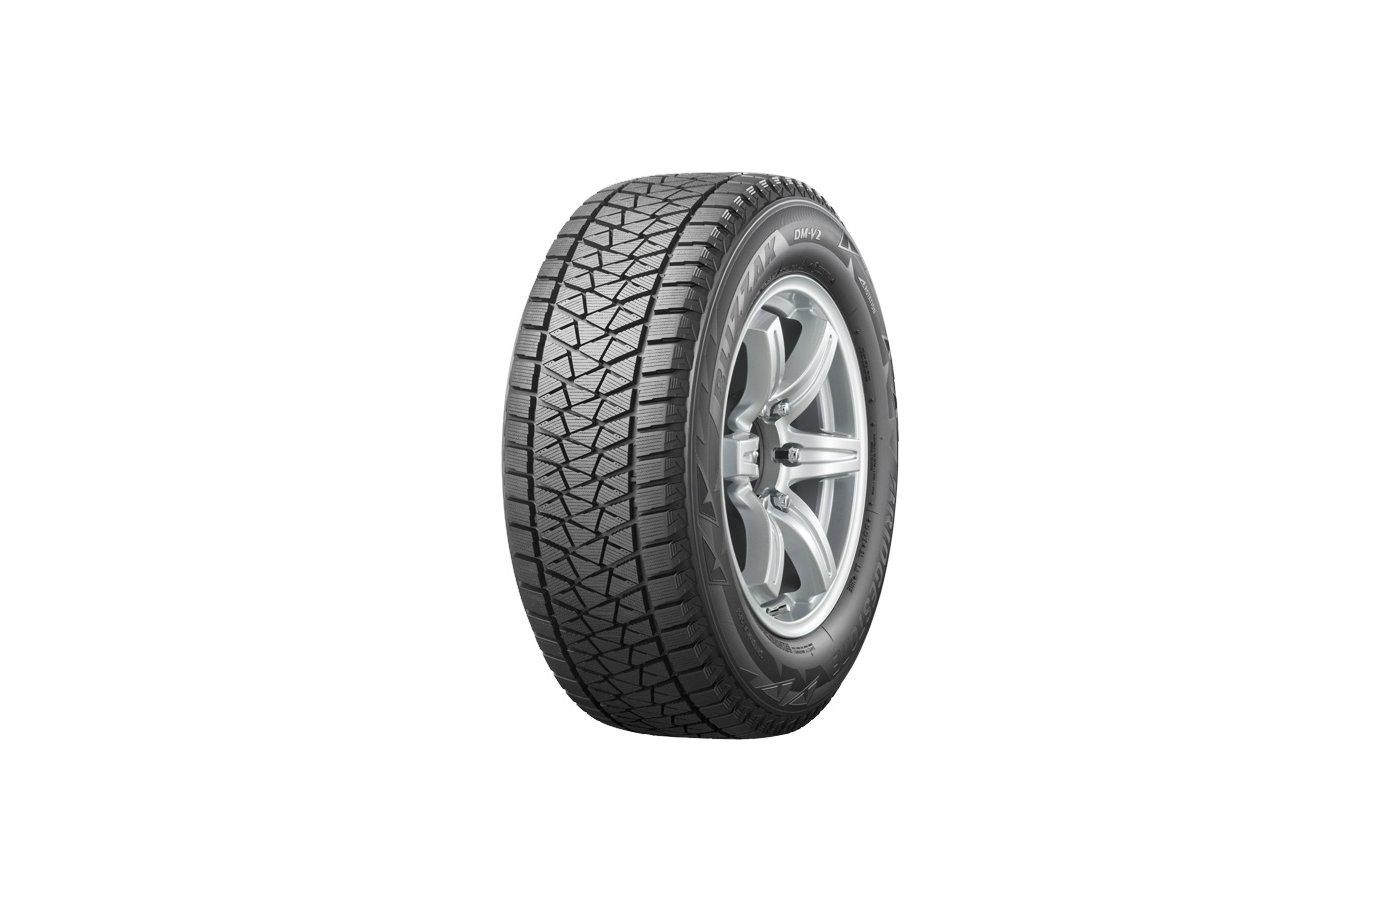 Шина Bridgestone Blizzak DM-V2 225/65 R17 TL 102S